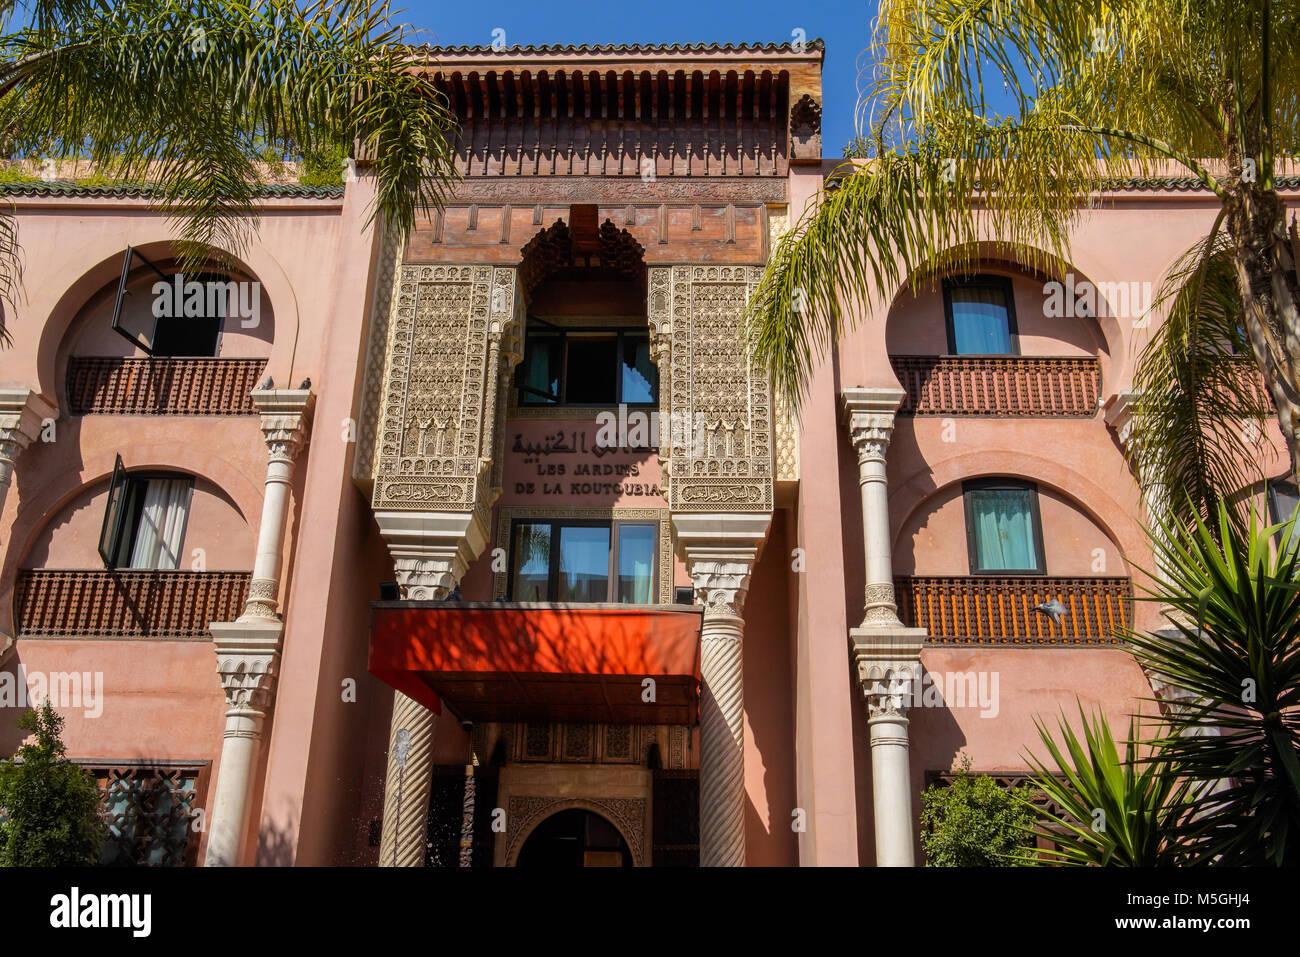 Les Jardins De La Koutoubia Hotel By Jamaa El Fna Square Marrakesh